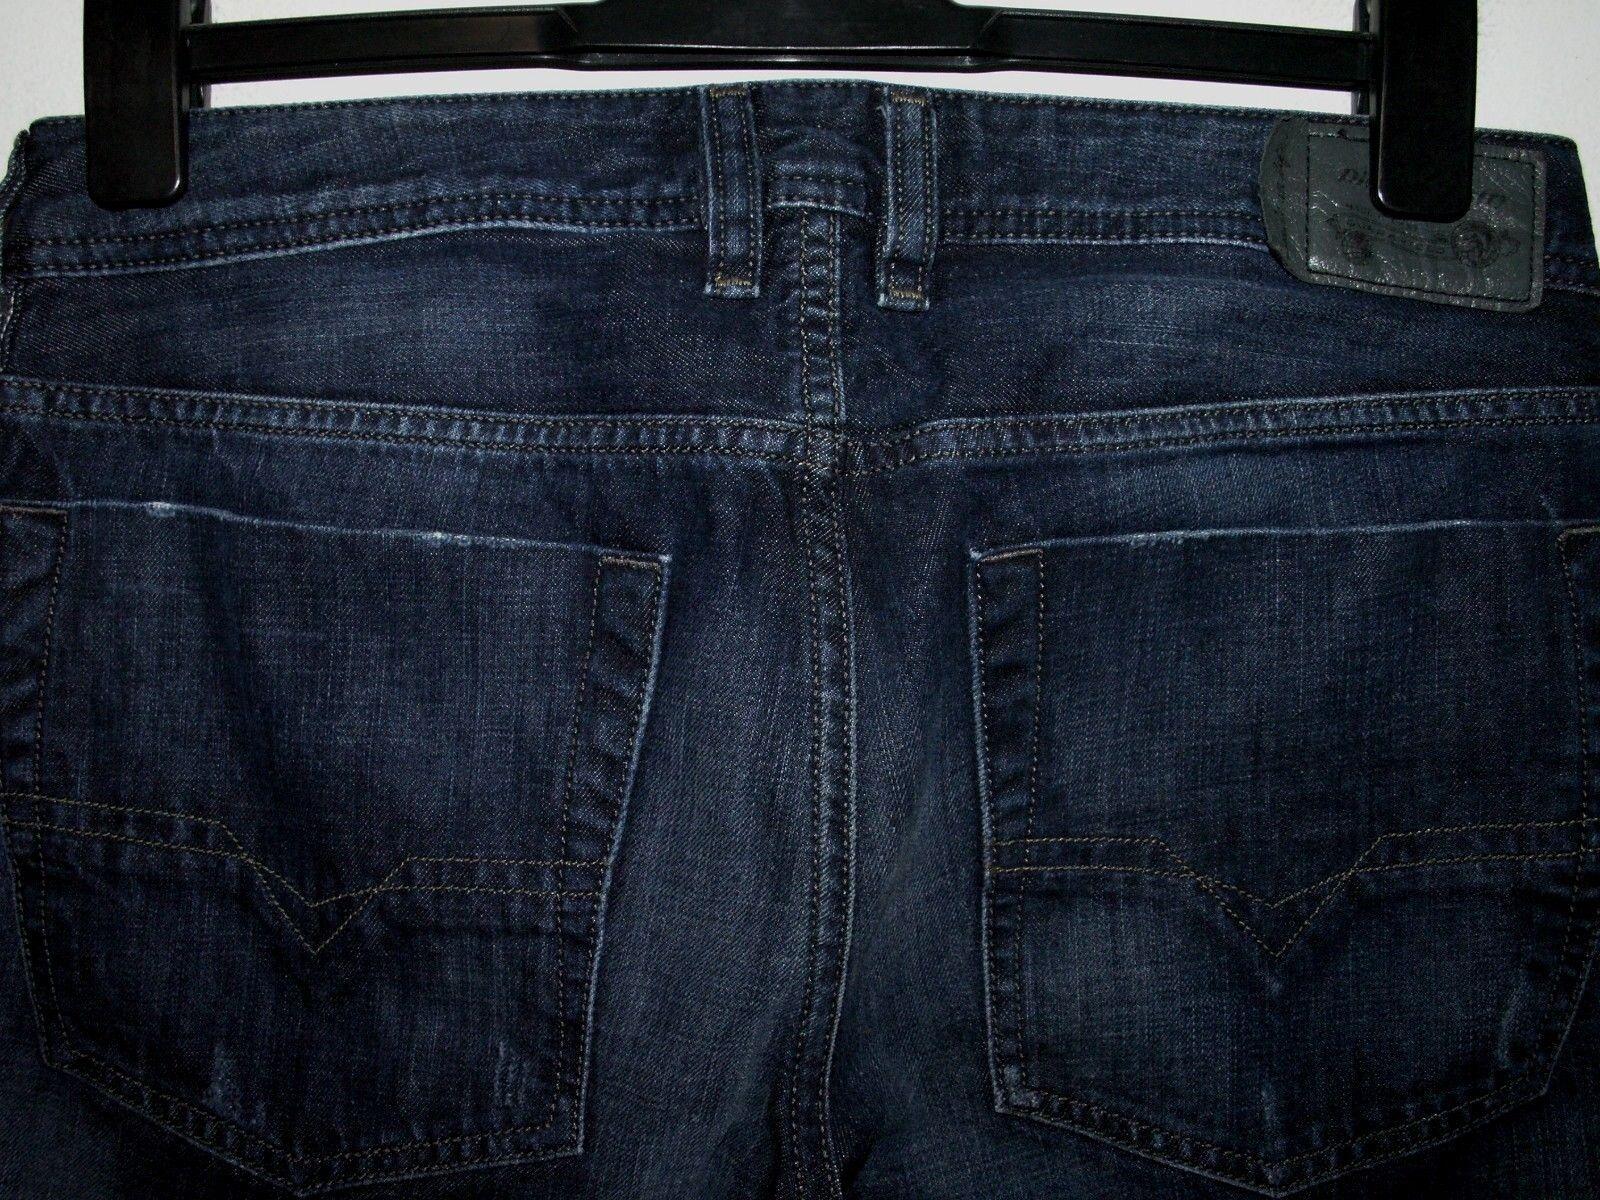 DIESEL Jeans avviocut Zatiny Lavare R831Q W30 L30 (a3650) .99 .99 .99 VENDITA .99 29fa2f